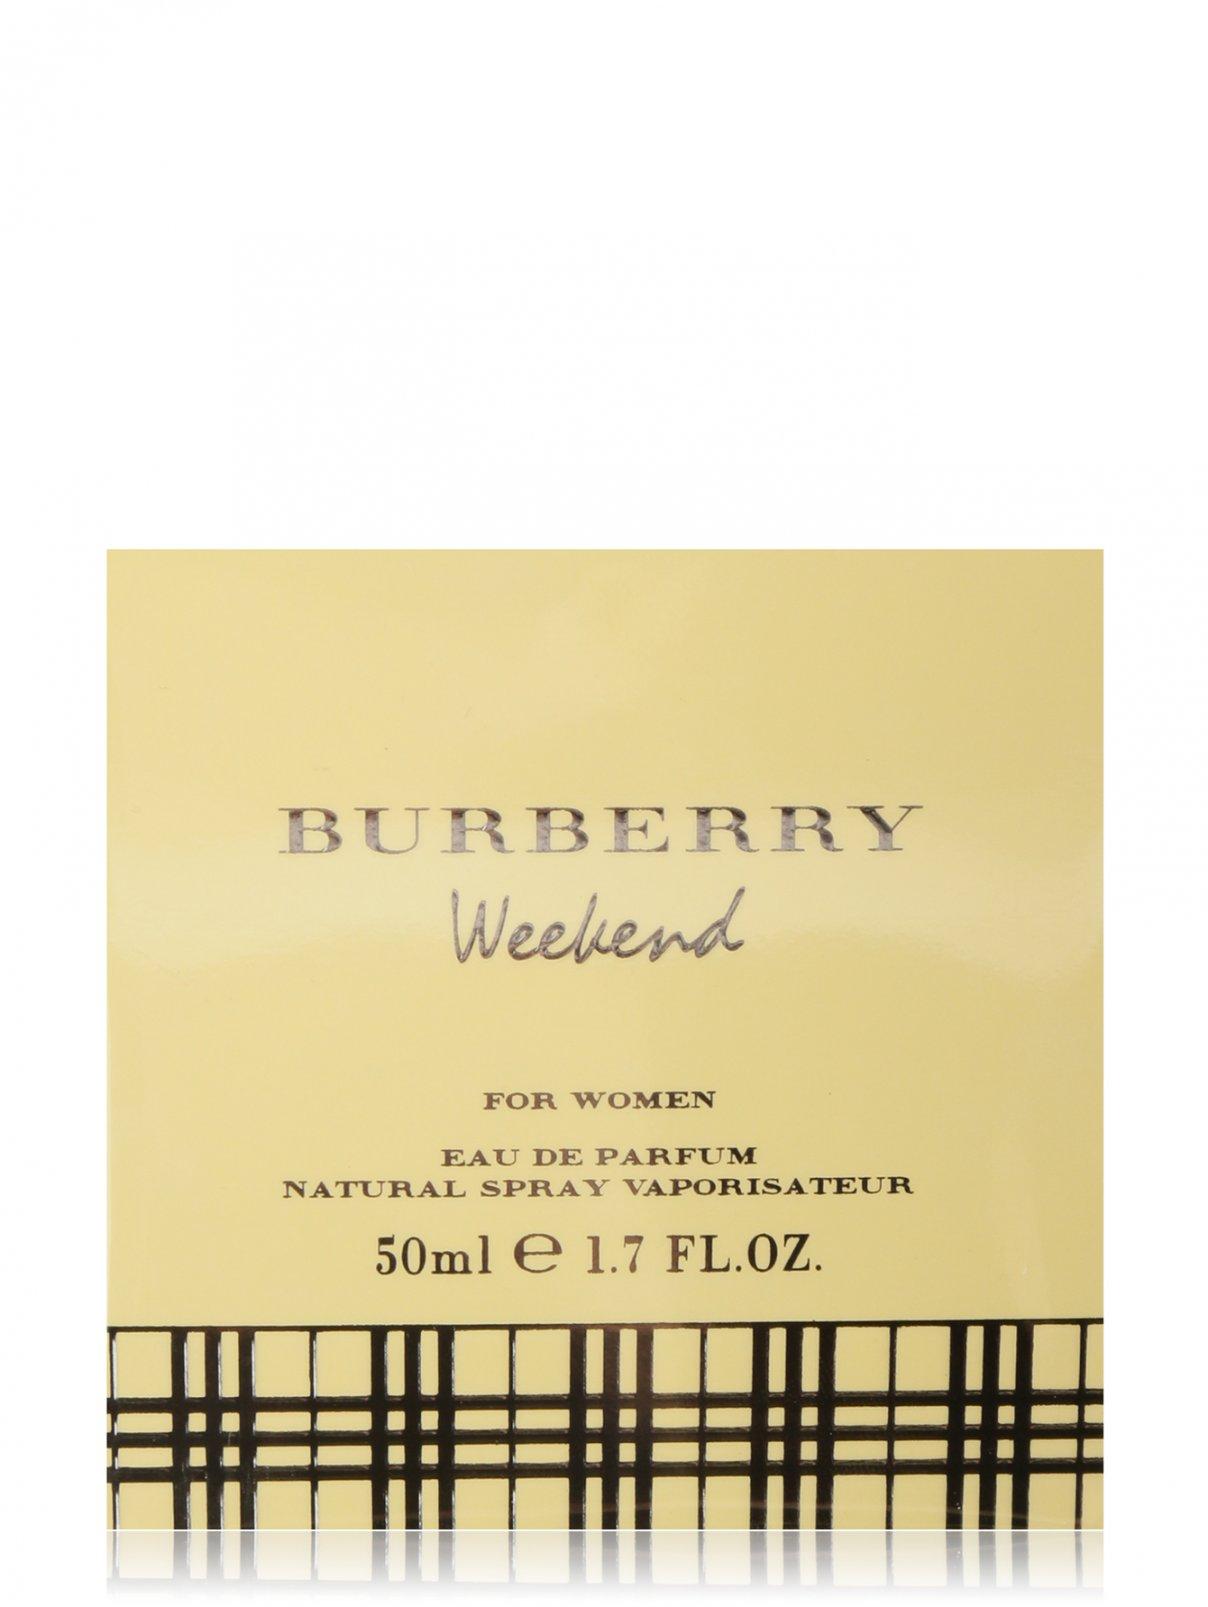 Парфюмерия Burberry  –  Общий вид